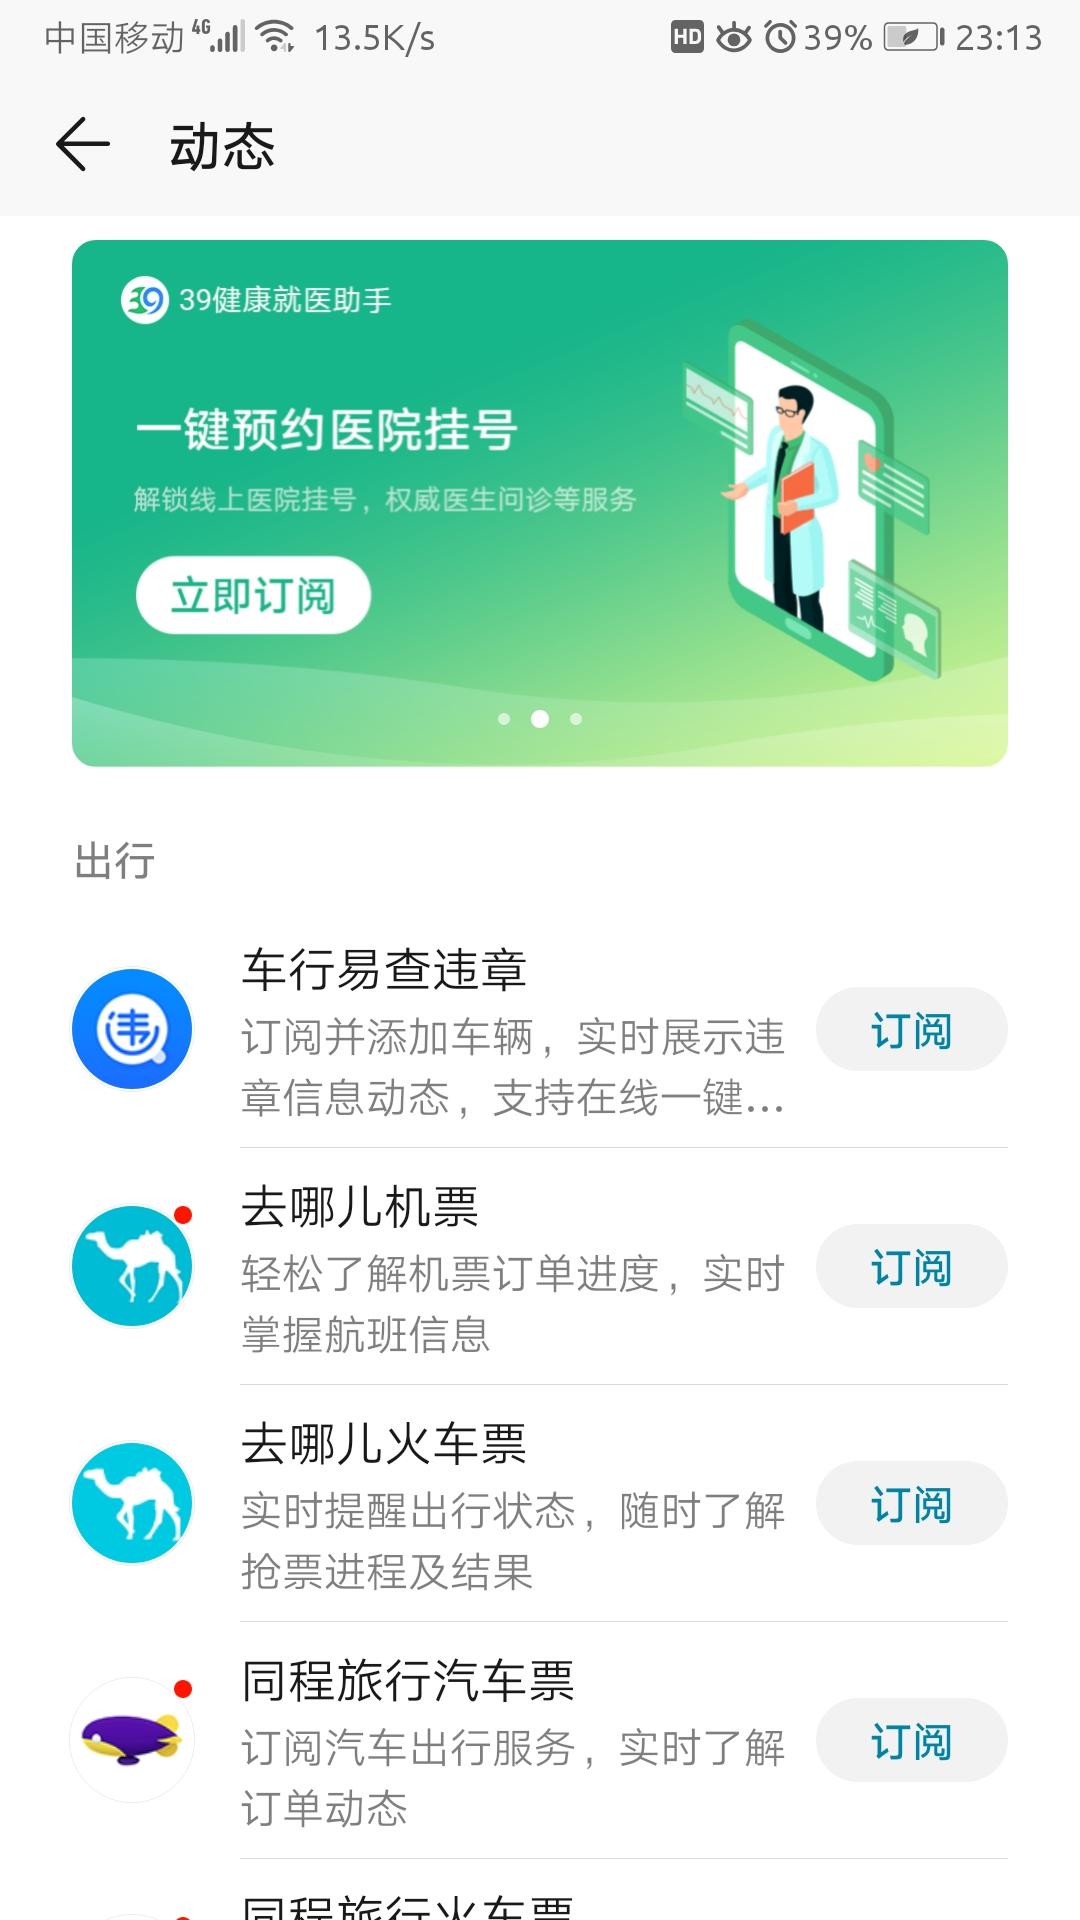 Screenshot_20201026_231314_com.huawei.intelligent.jpg